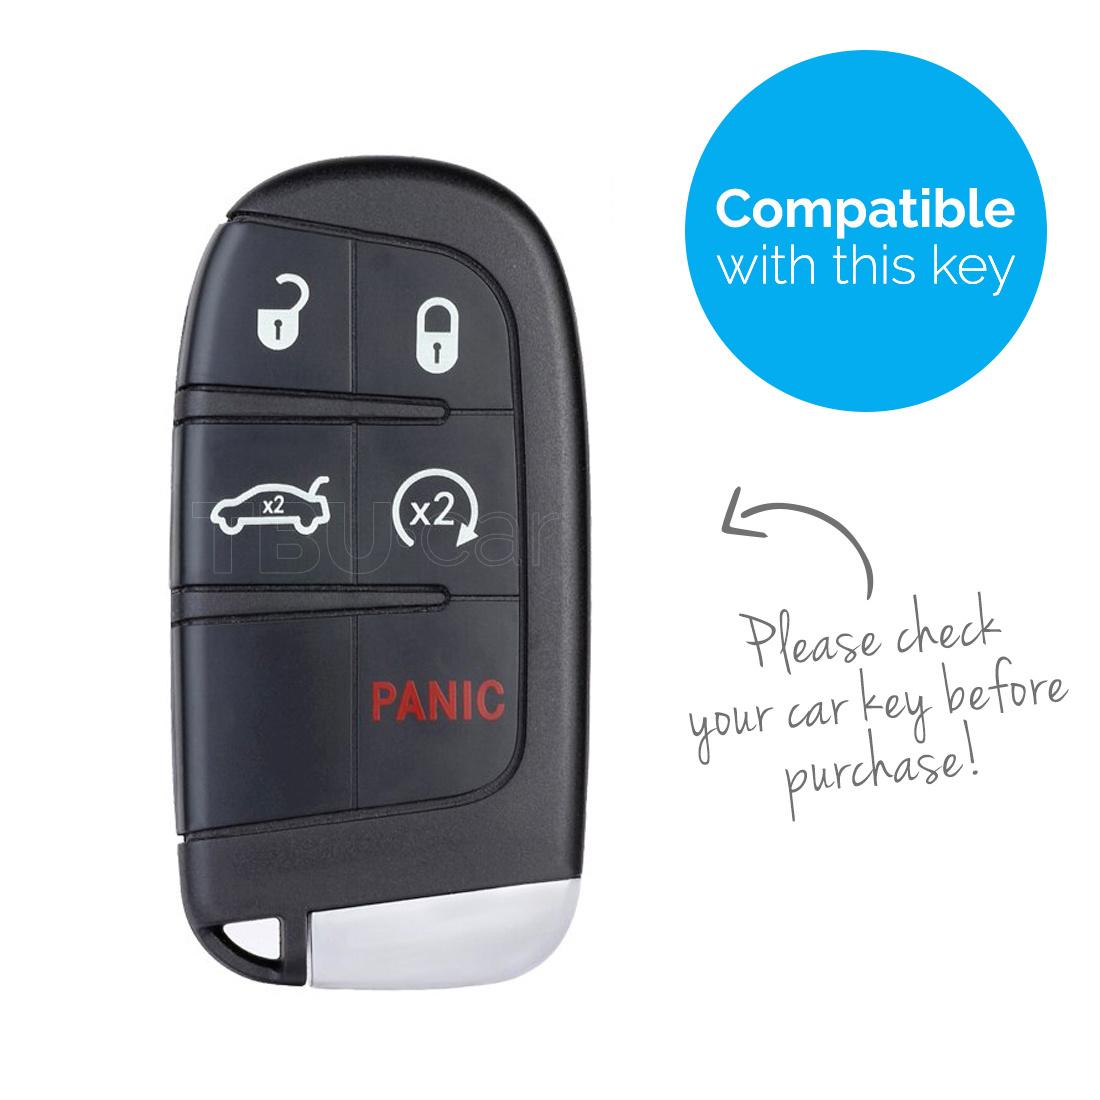 TBU car TBU car Sleutel cover compatibel met Fiat - TPU sleutel hoesje / beschermhoesje autosleutel - Roségoud